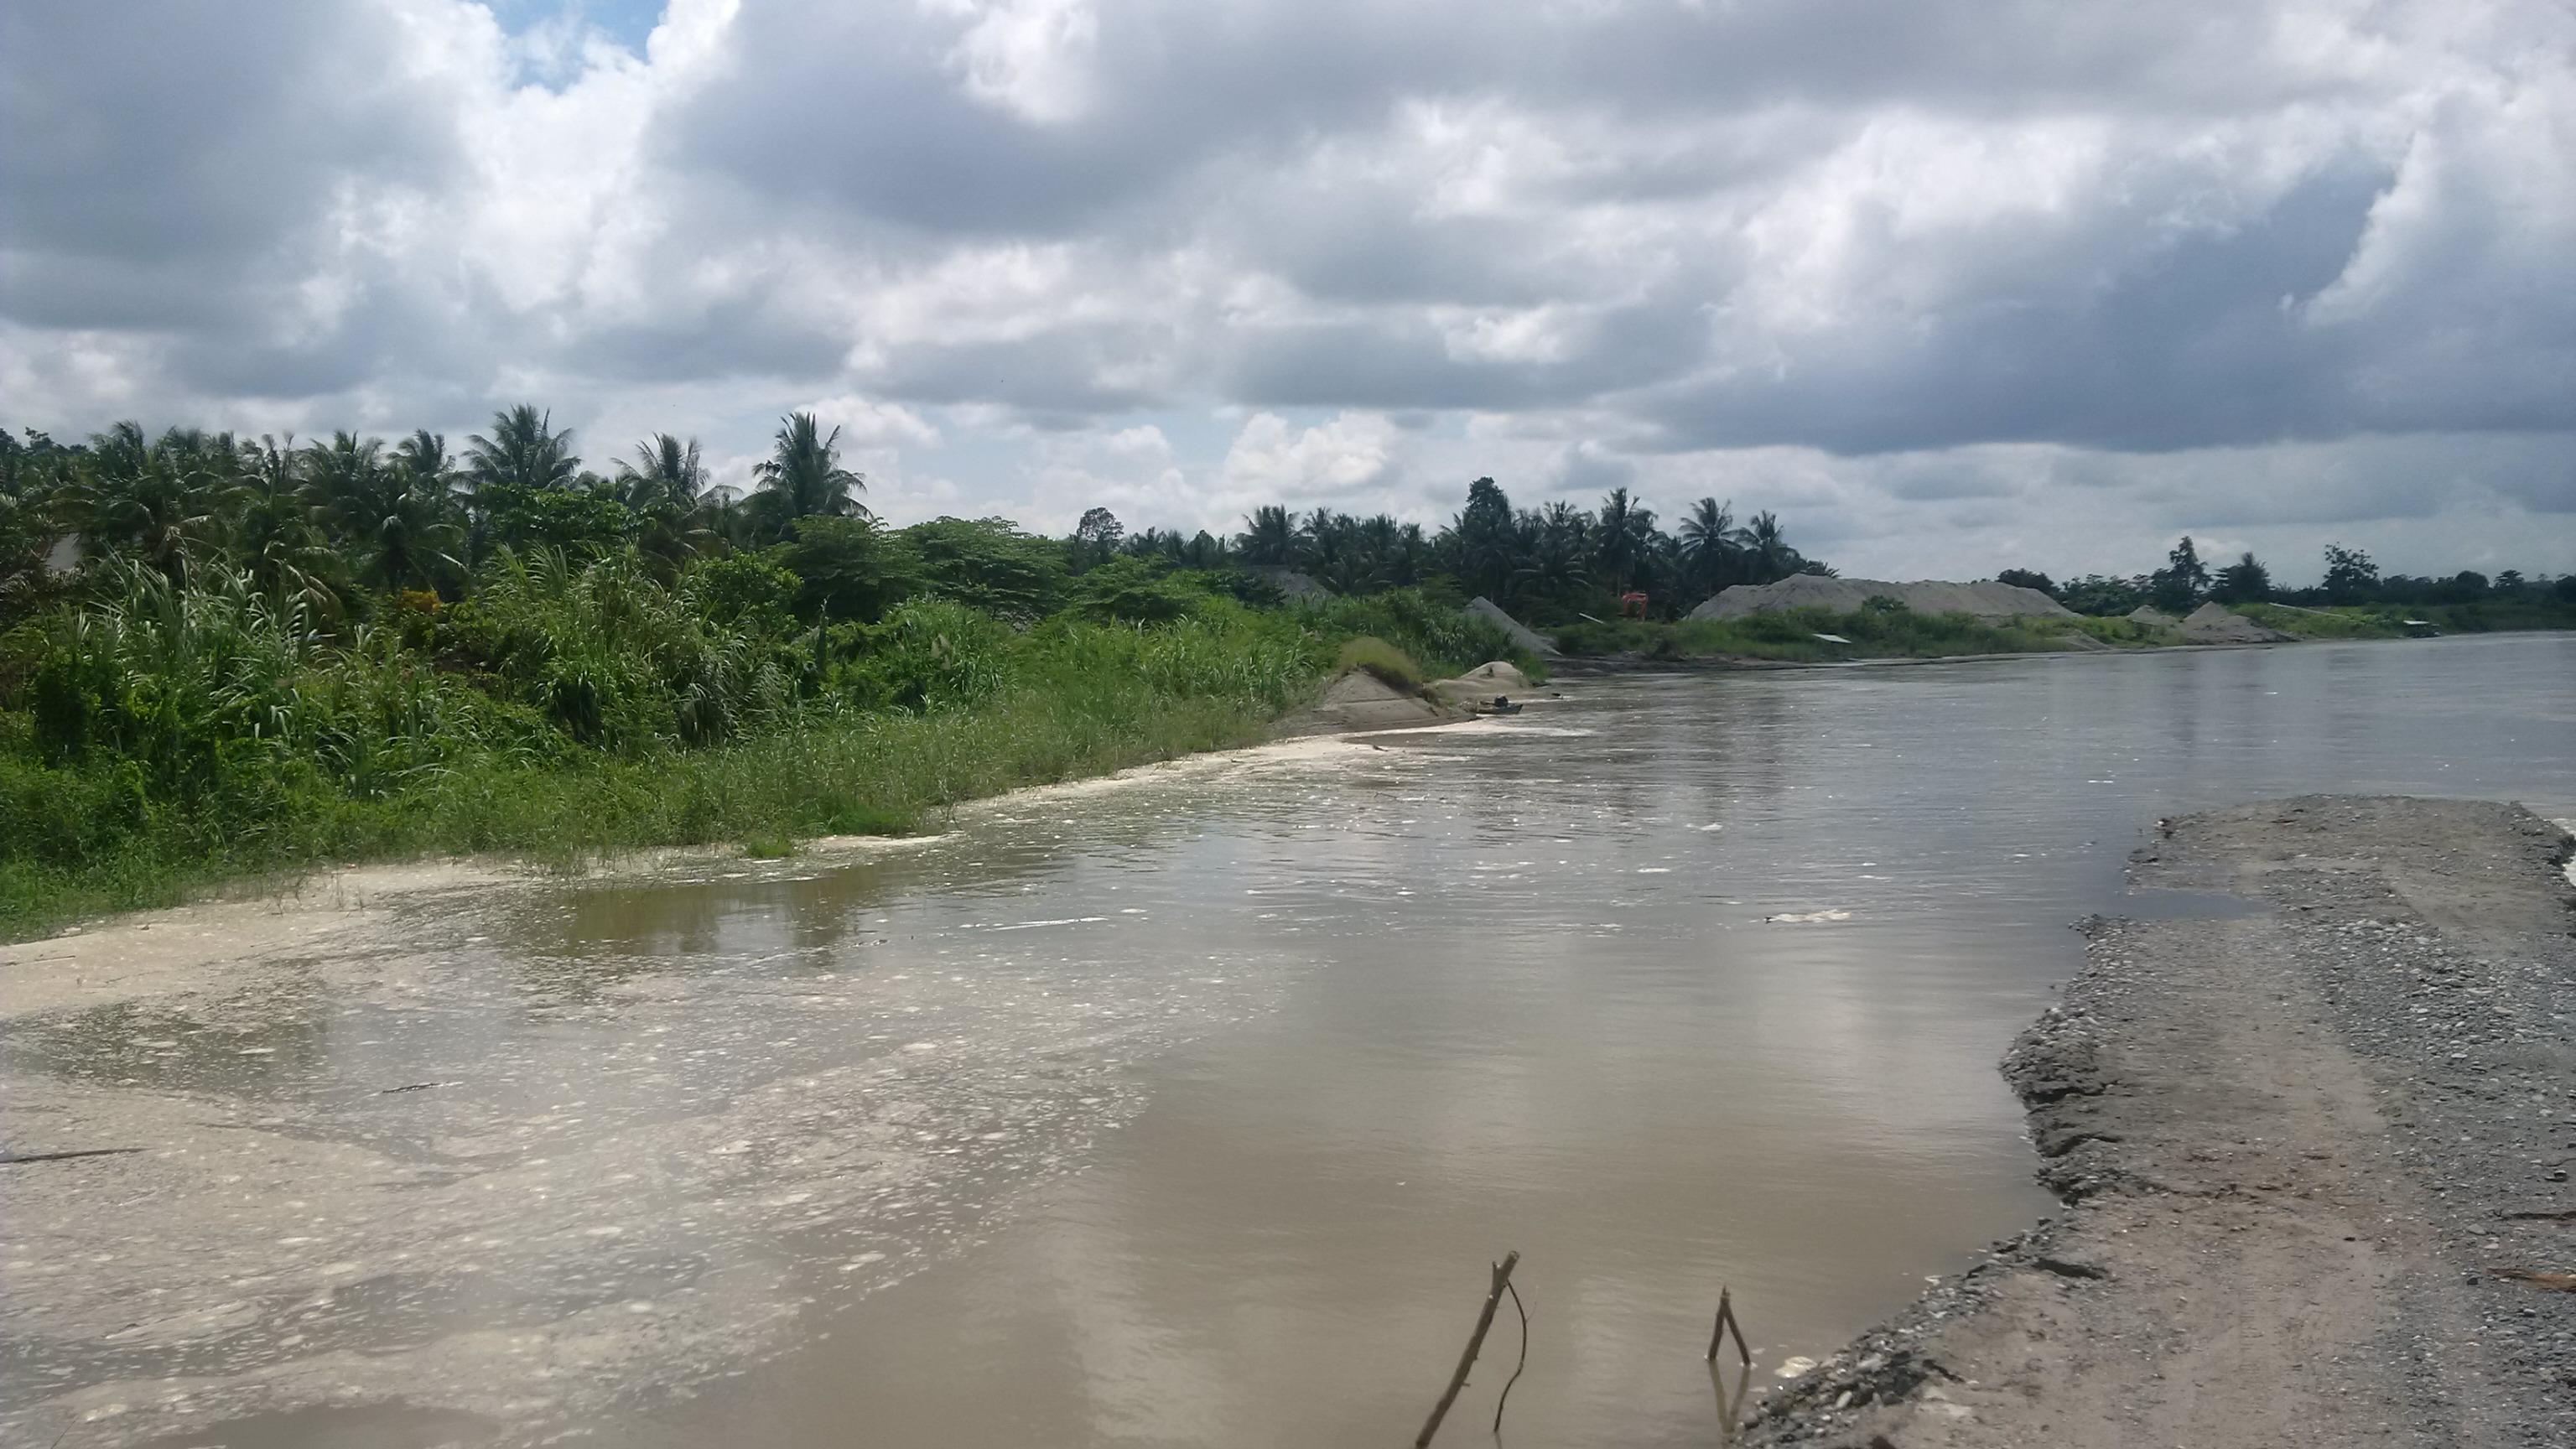 Tanggul sungat lariang yang telahh ambruk ditelan sungai